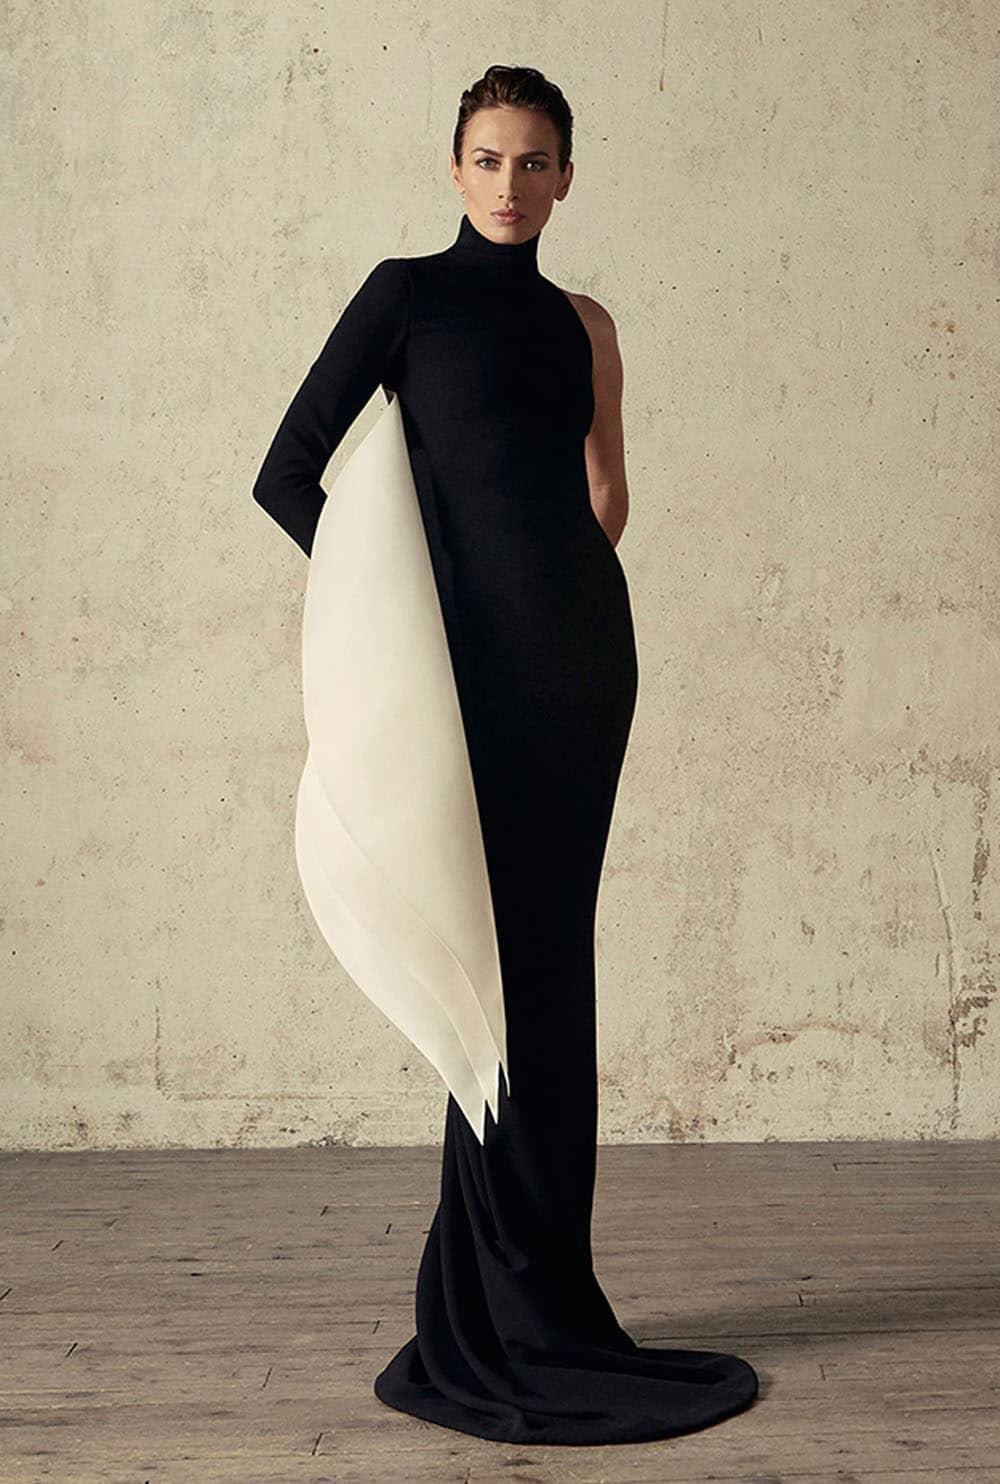 Eniwhere Fashion - S. Rolland 07